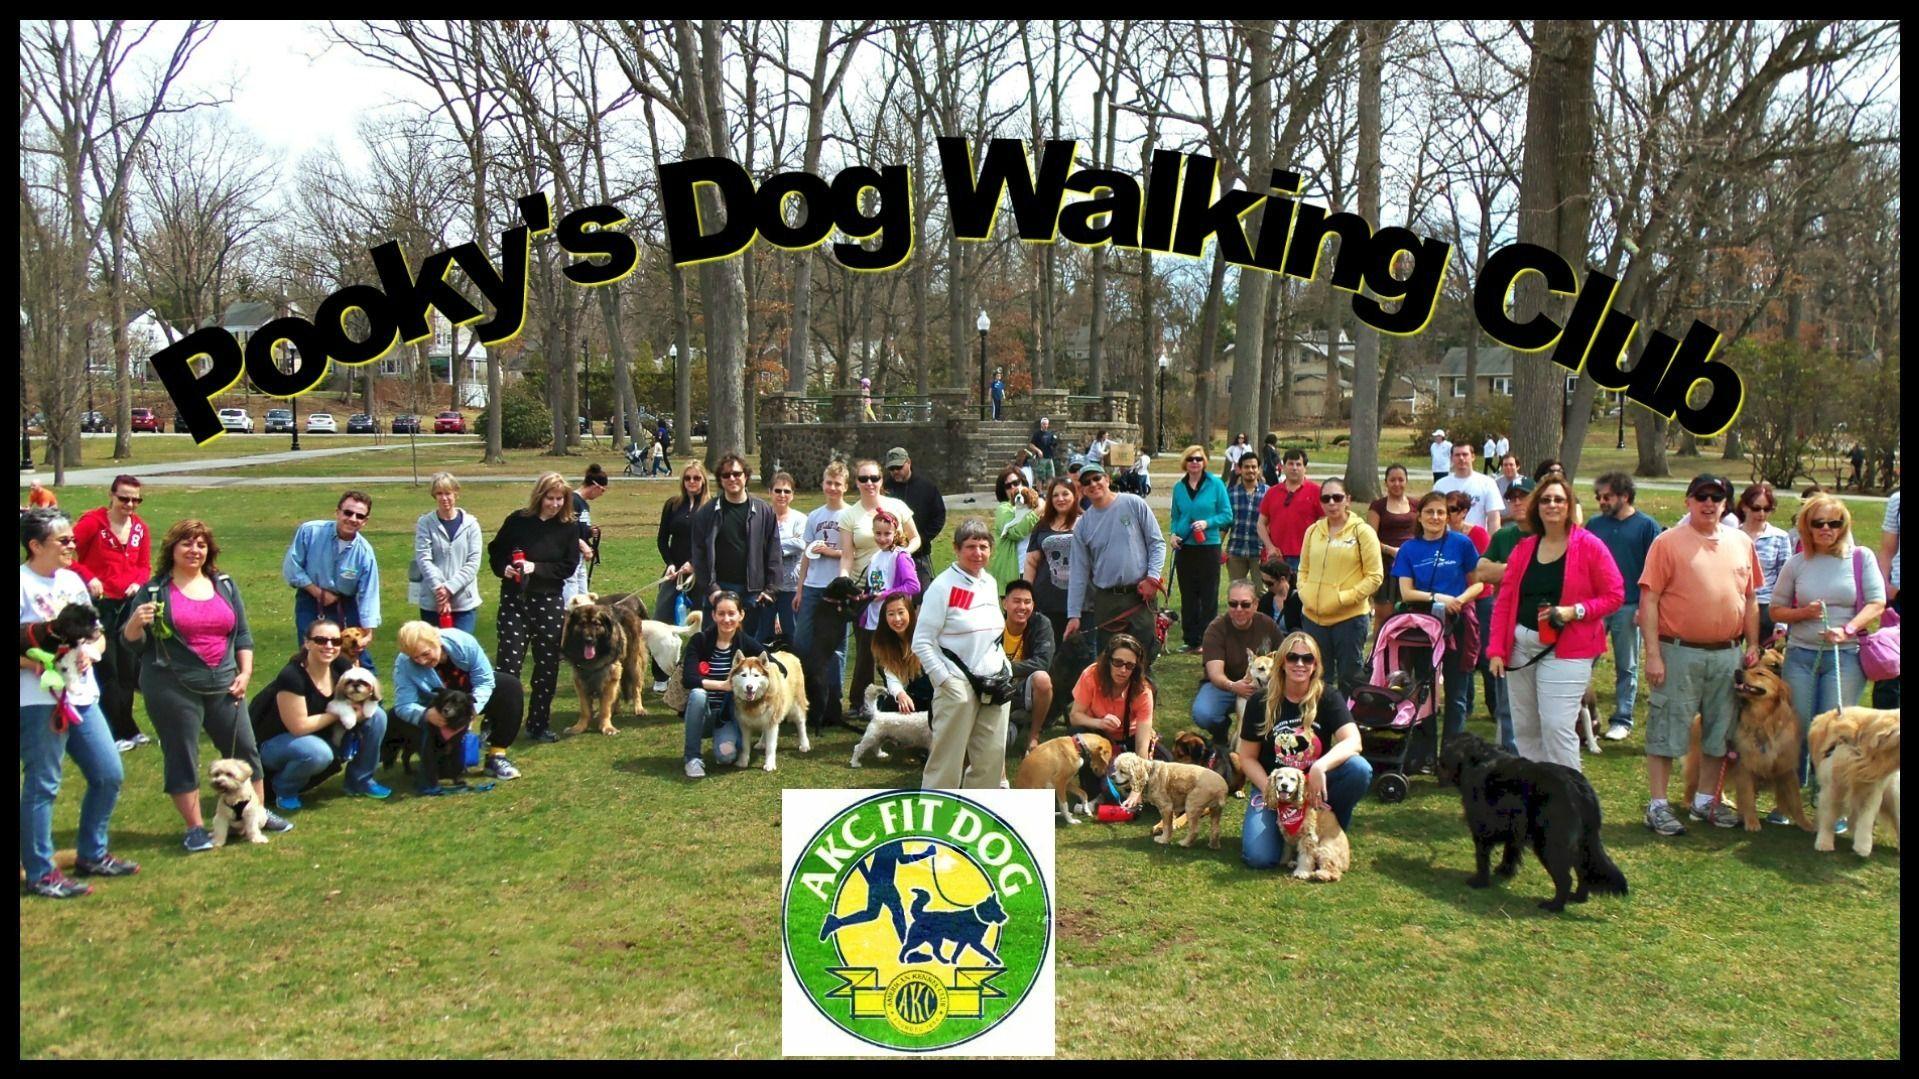 Pooky's Dog Walking Club